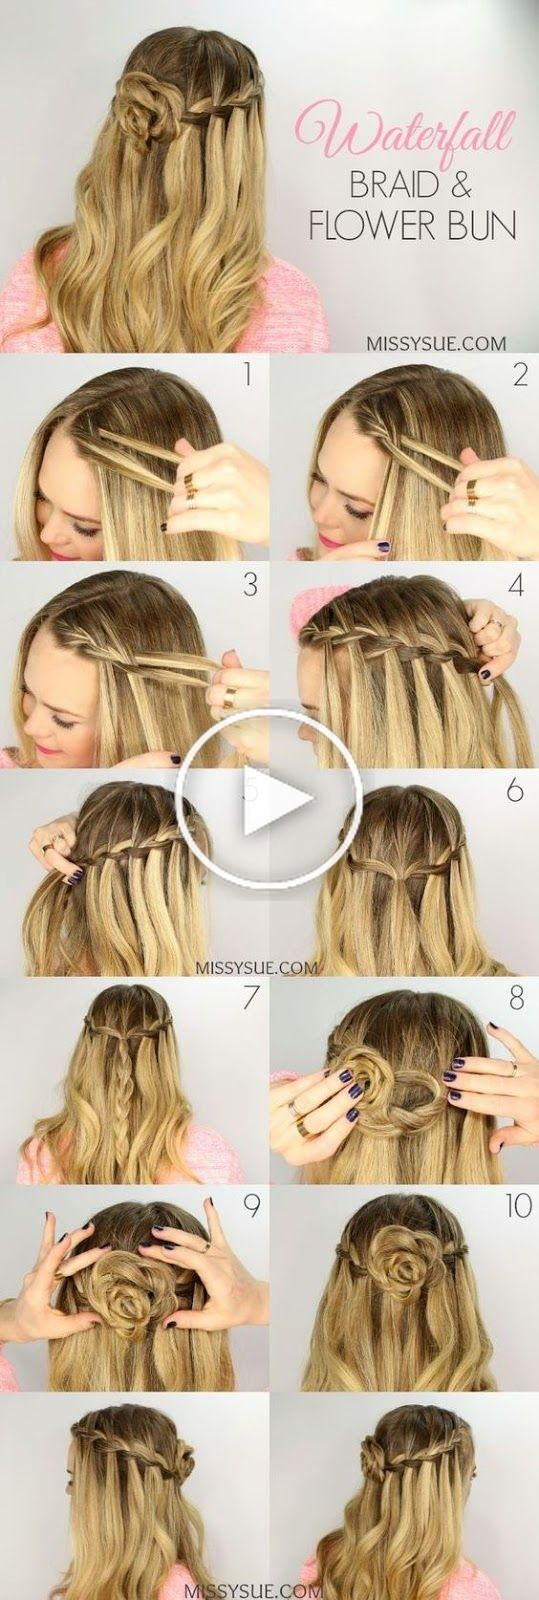 Cascade Braid Et Fleurs Bun In 2020 Medium Length Hair Styles Long Hair Styles Easy Hairstyles For Long Hair